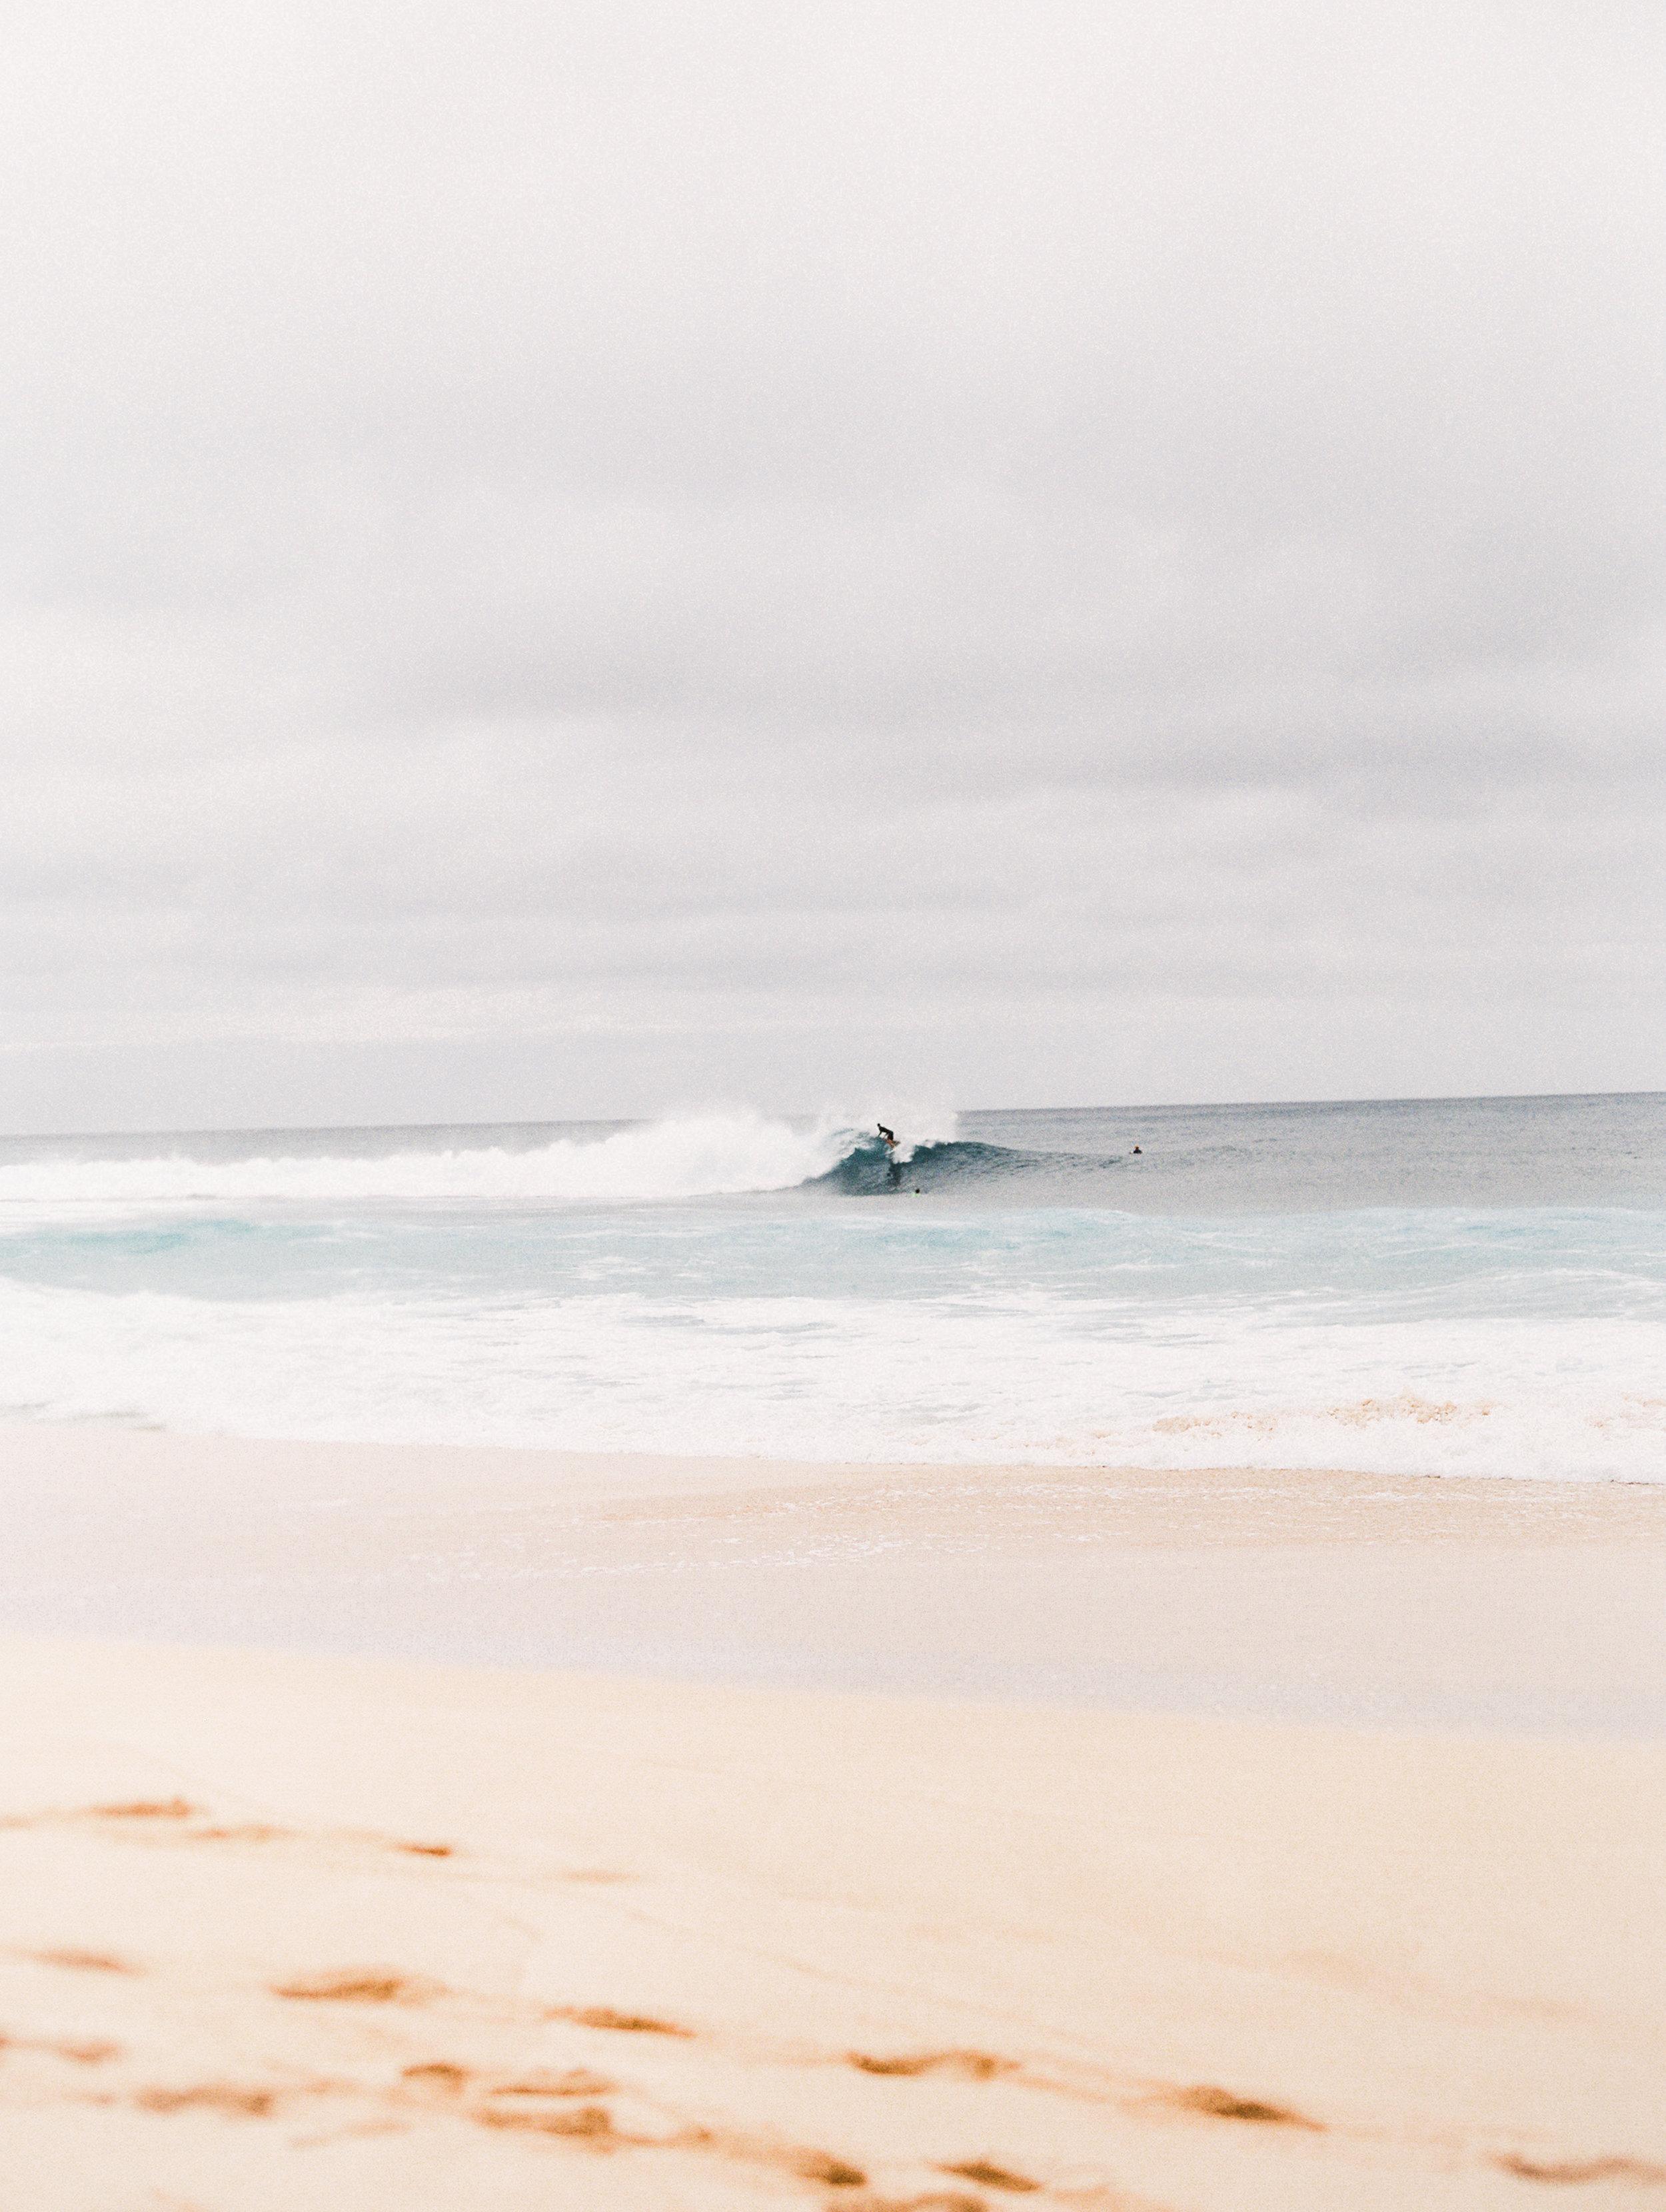 film-north-shore-surfer-kailee-dimeglio-photography-116.jpg